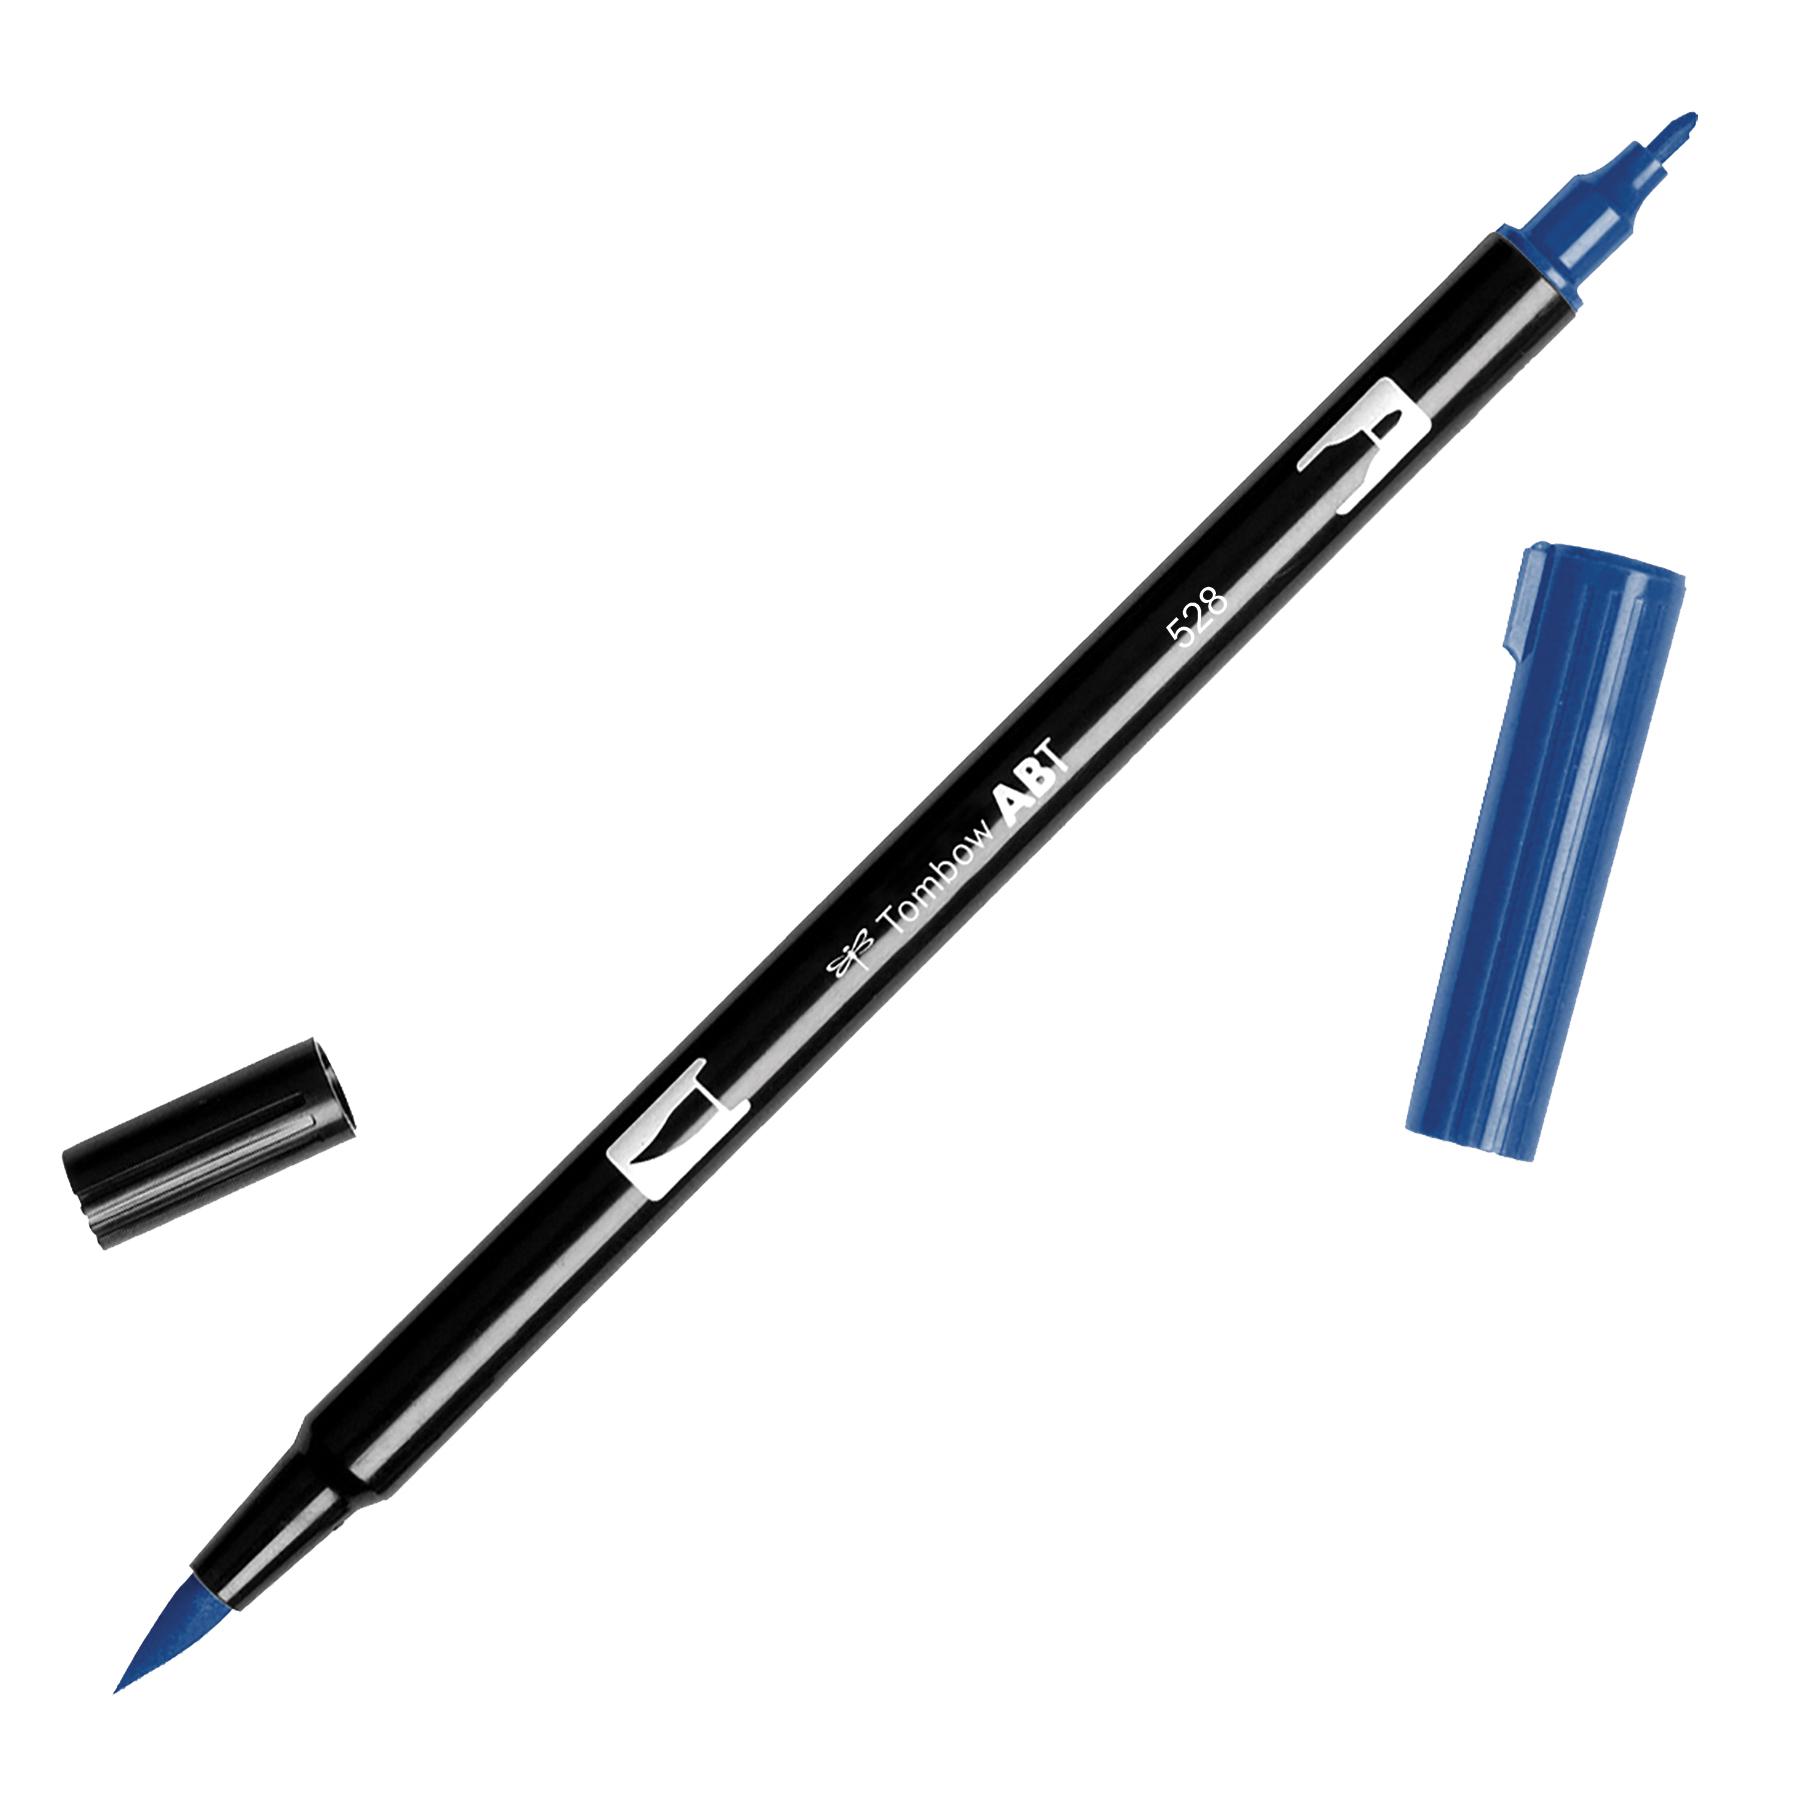 Tombow Dual Brush Marker Open Stock-528 Navy Blue